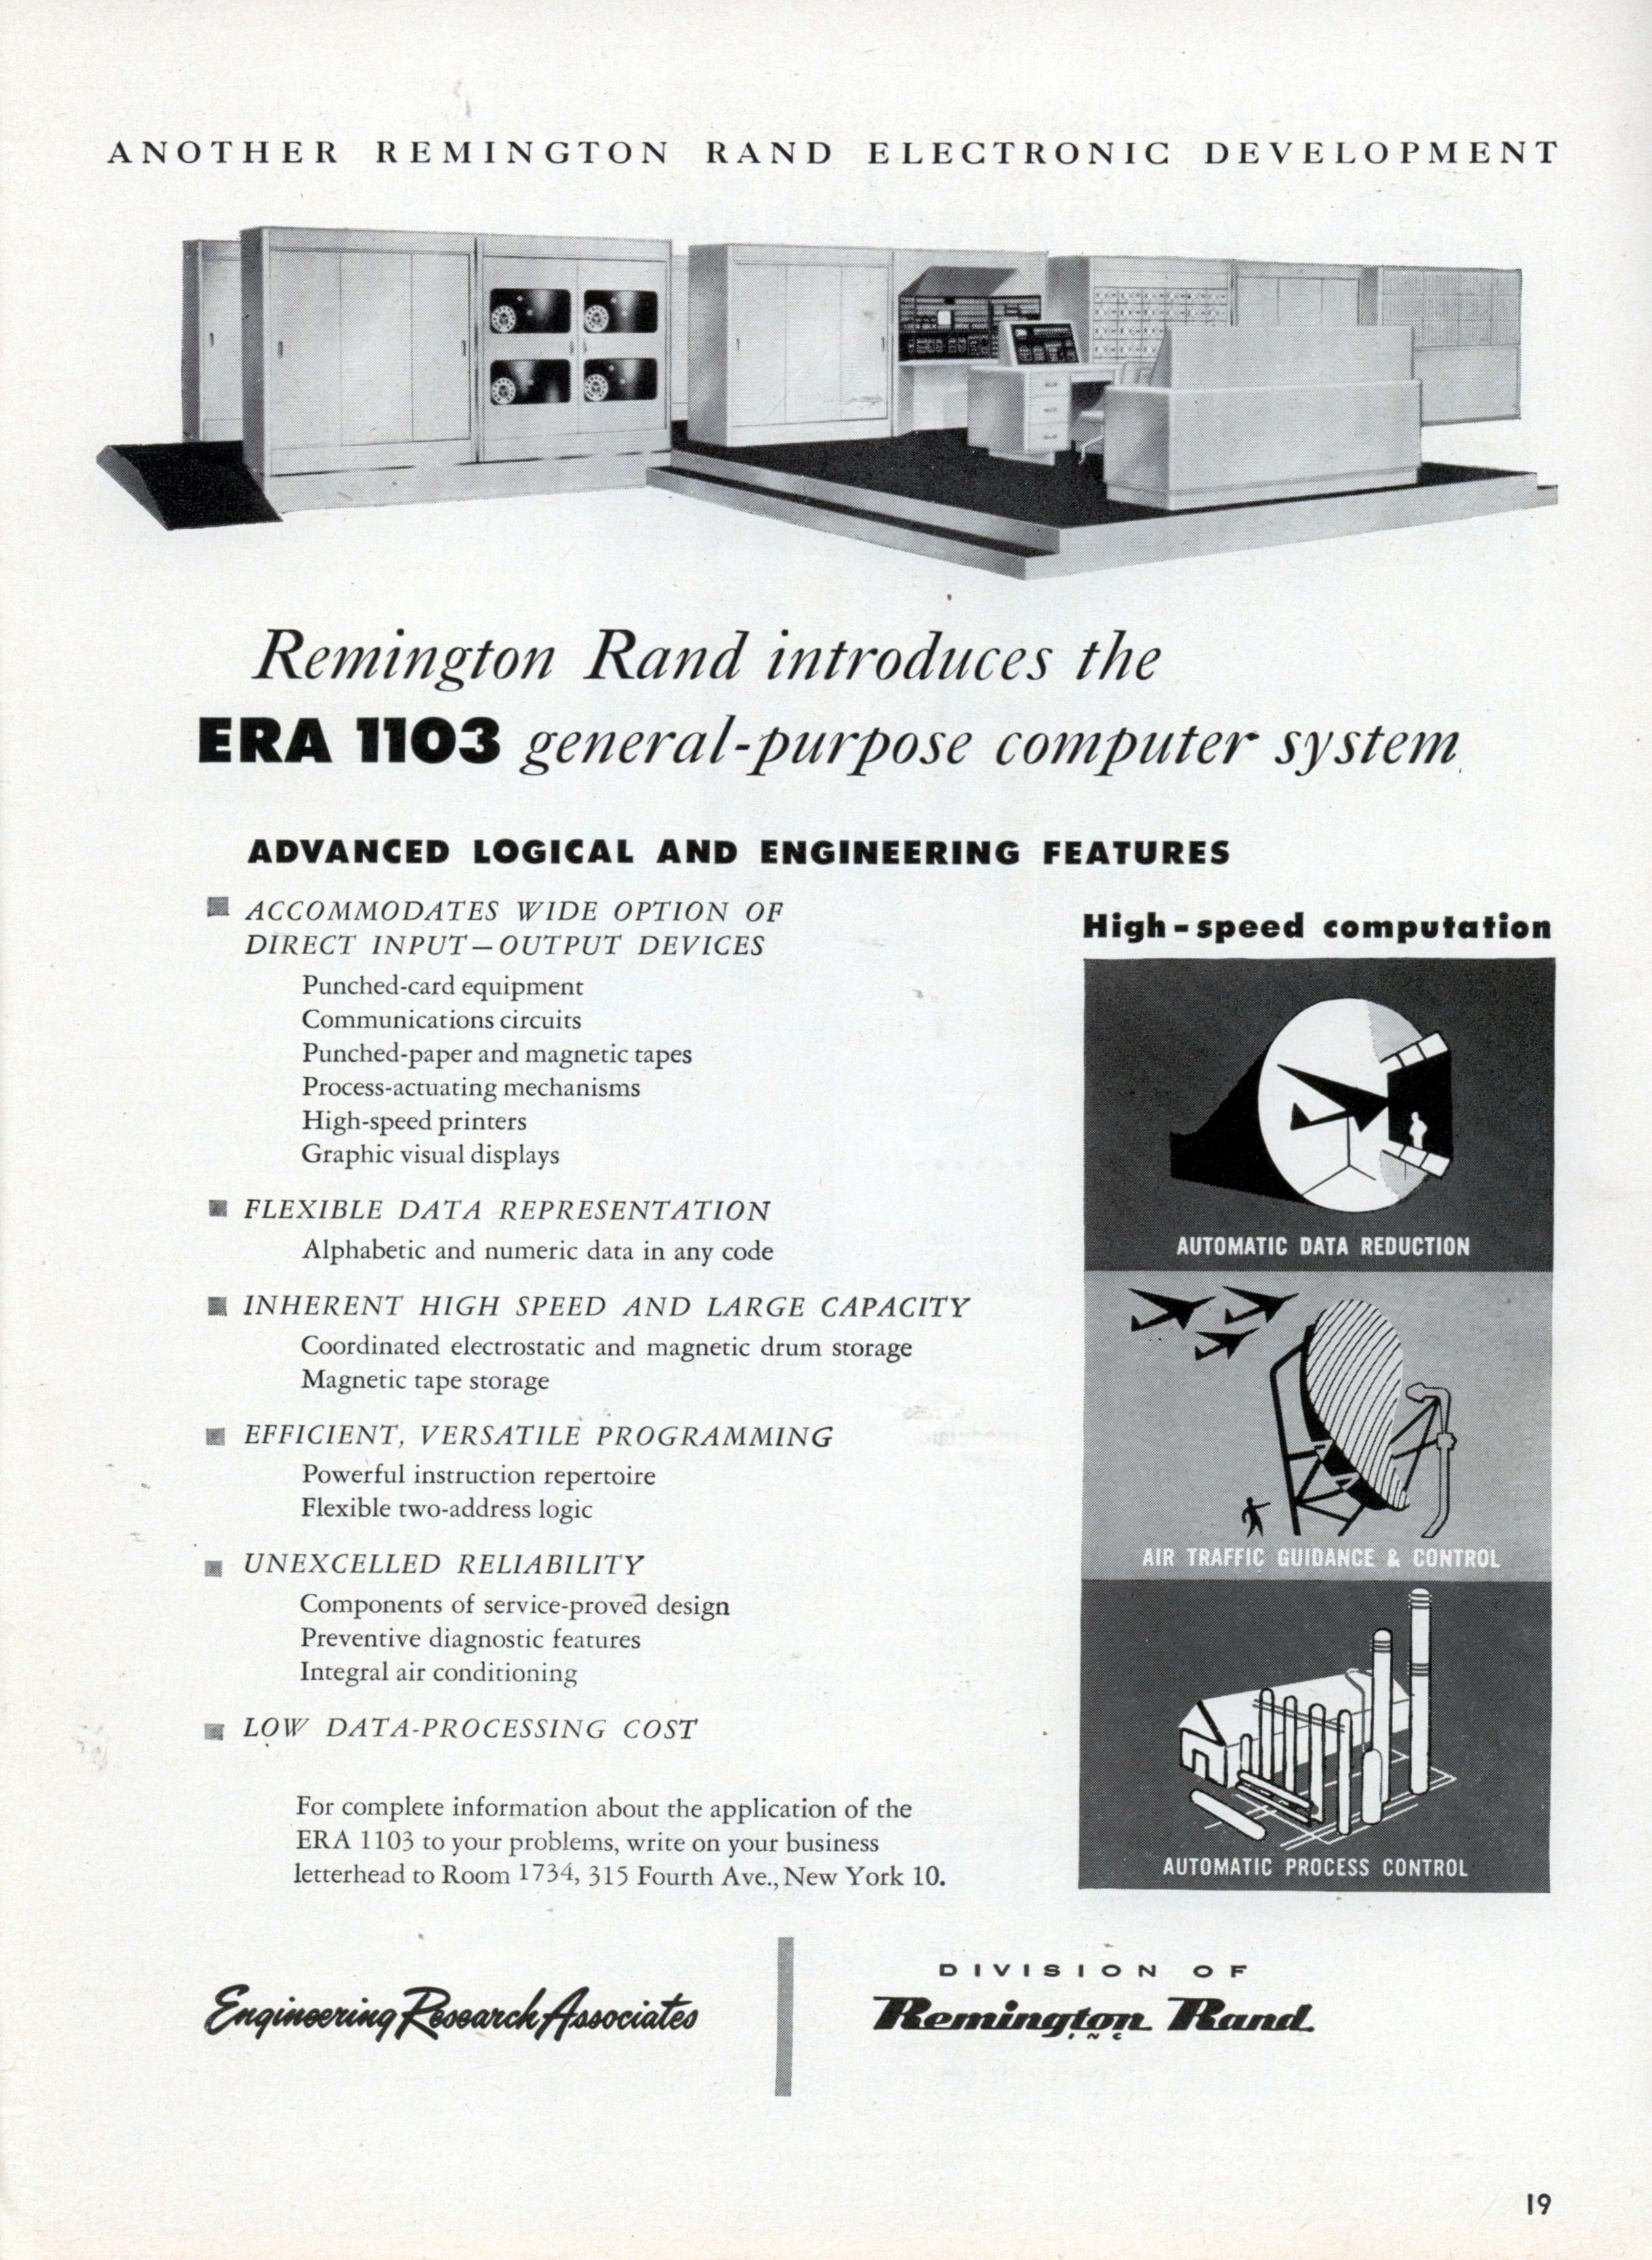 Remington Rand introduces the ERA 1103 general-purpose computer